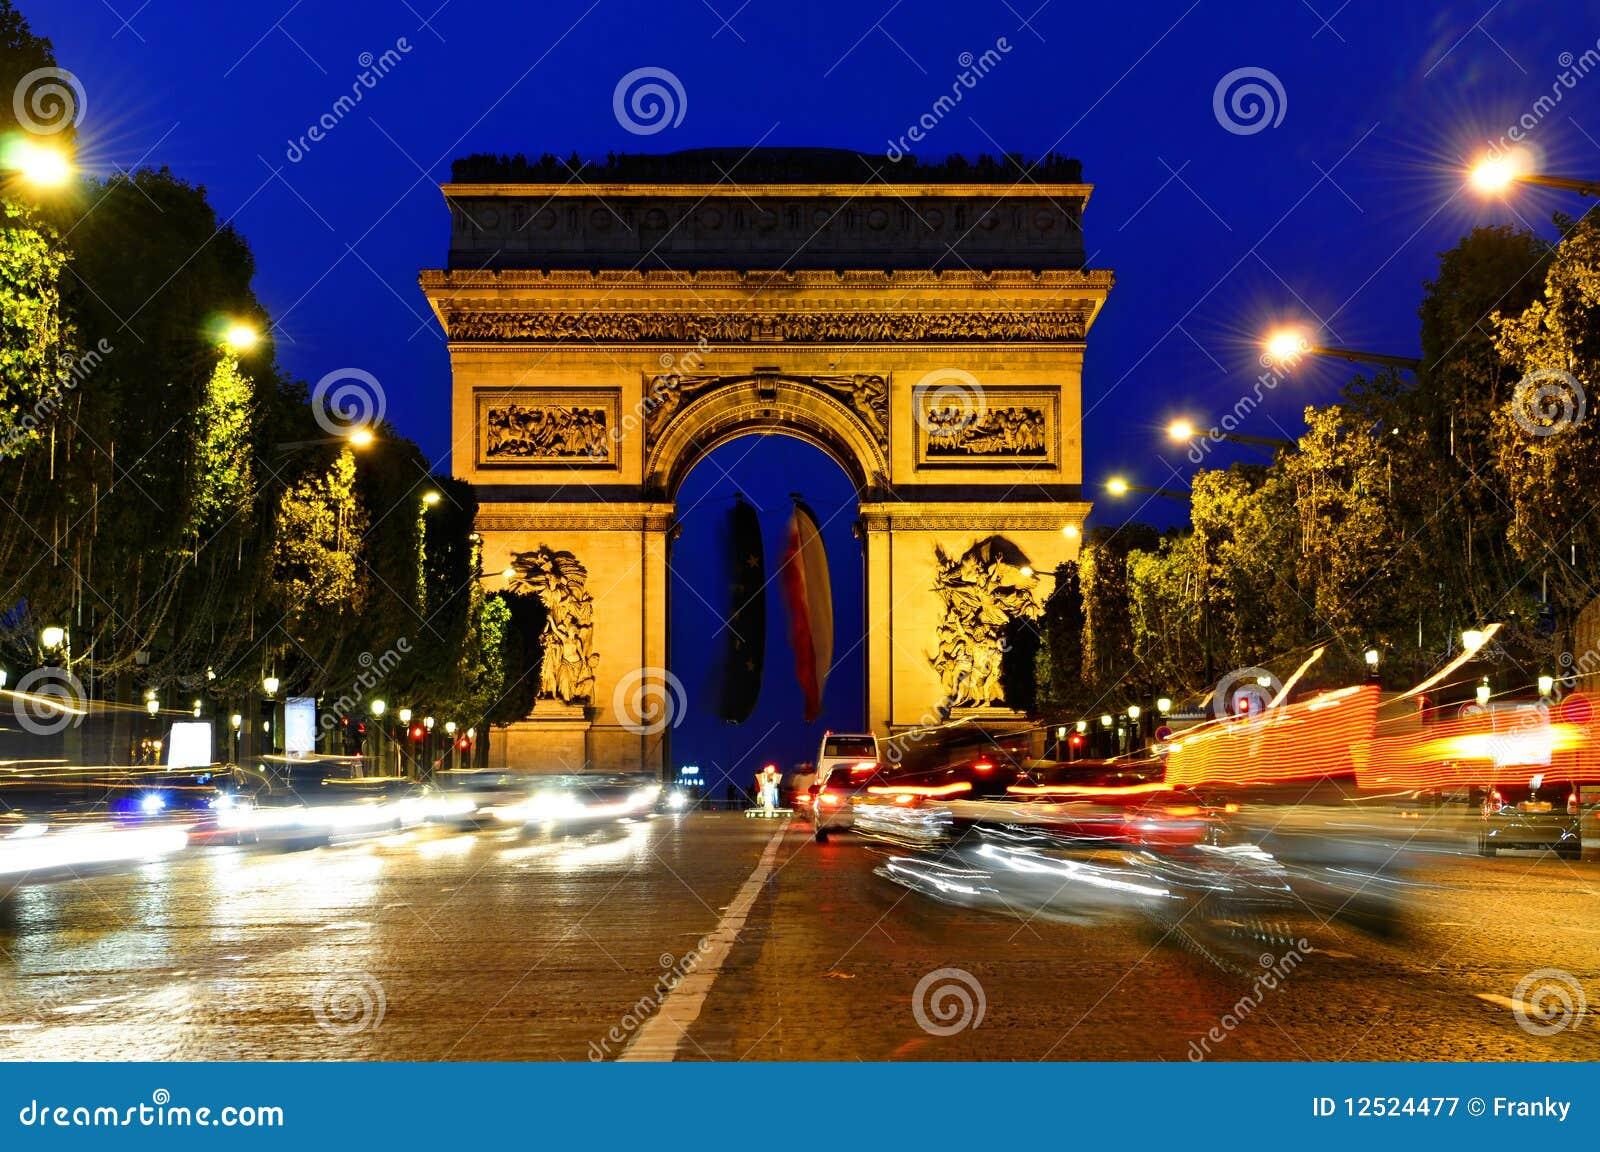 Arc de Triomphe - arco del trionfo, Parigi, Francia